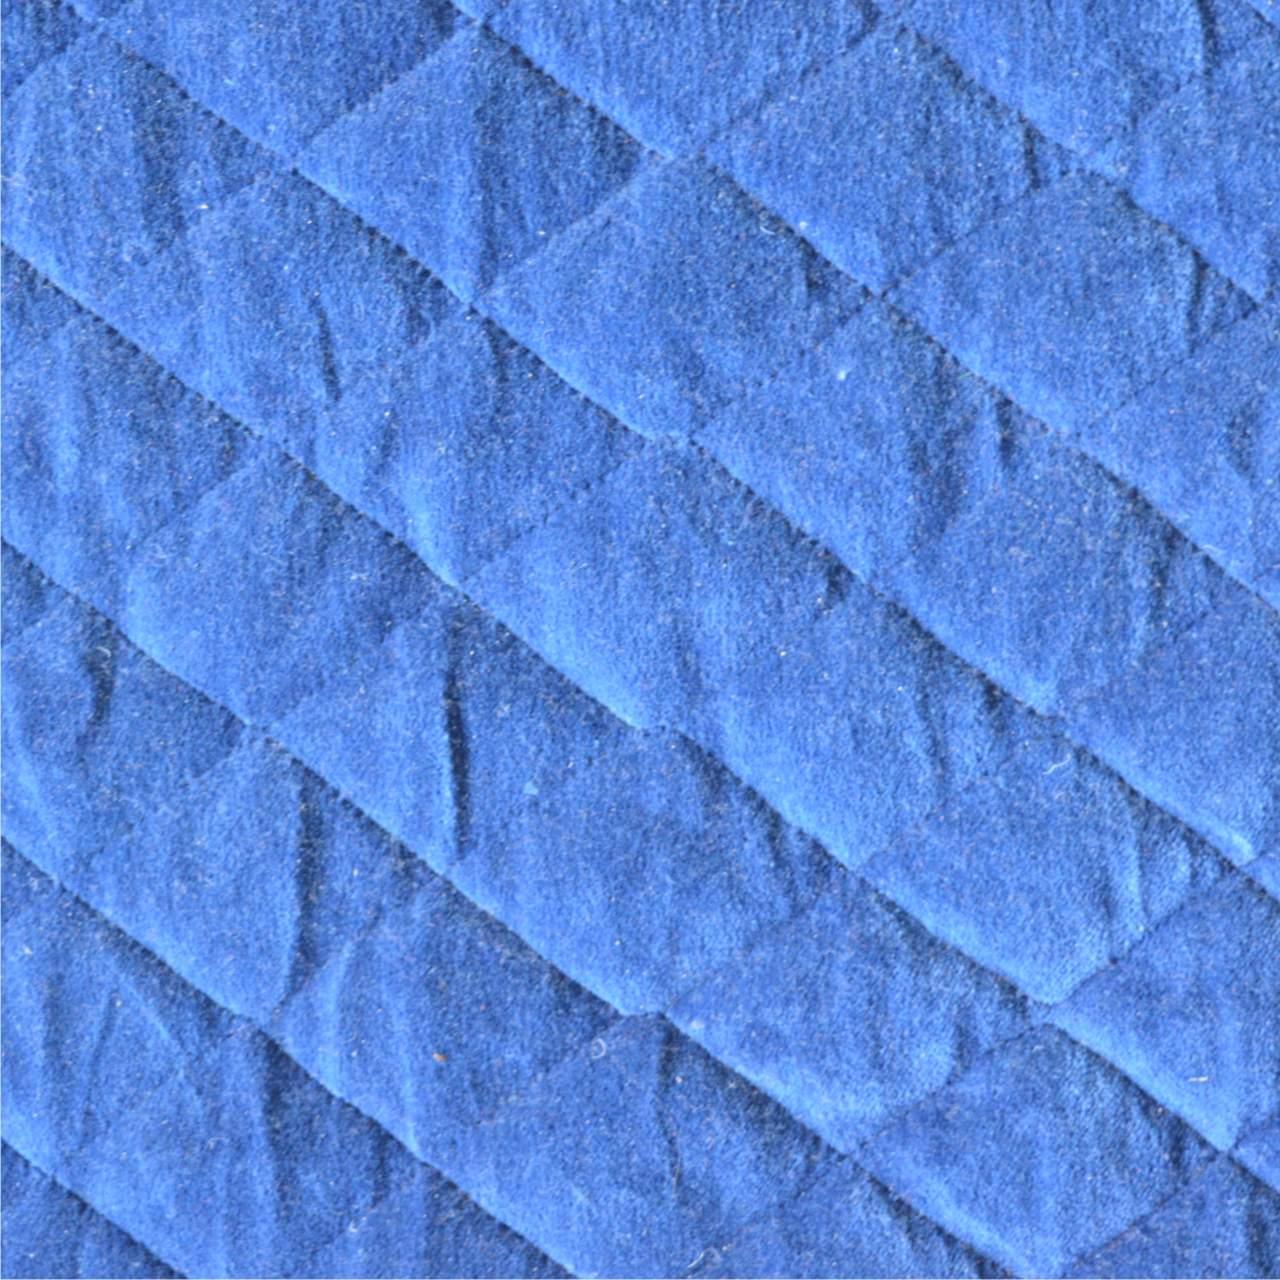 QULITED BLUE